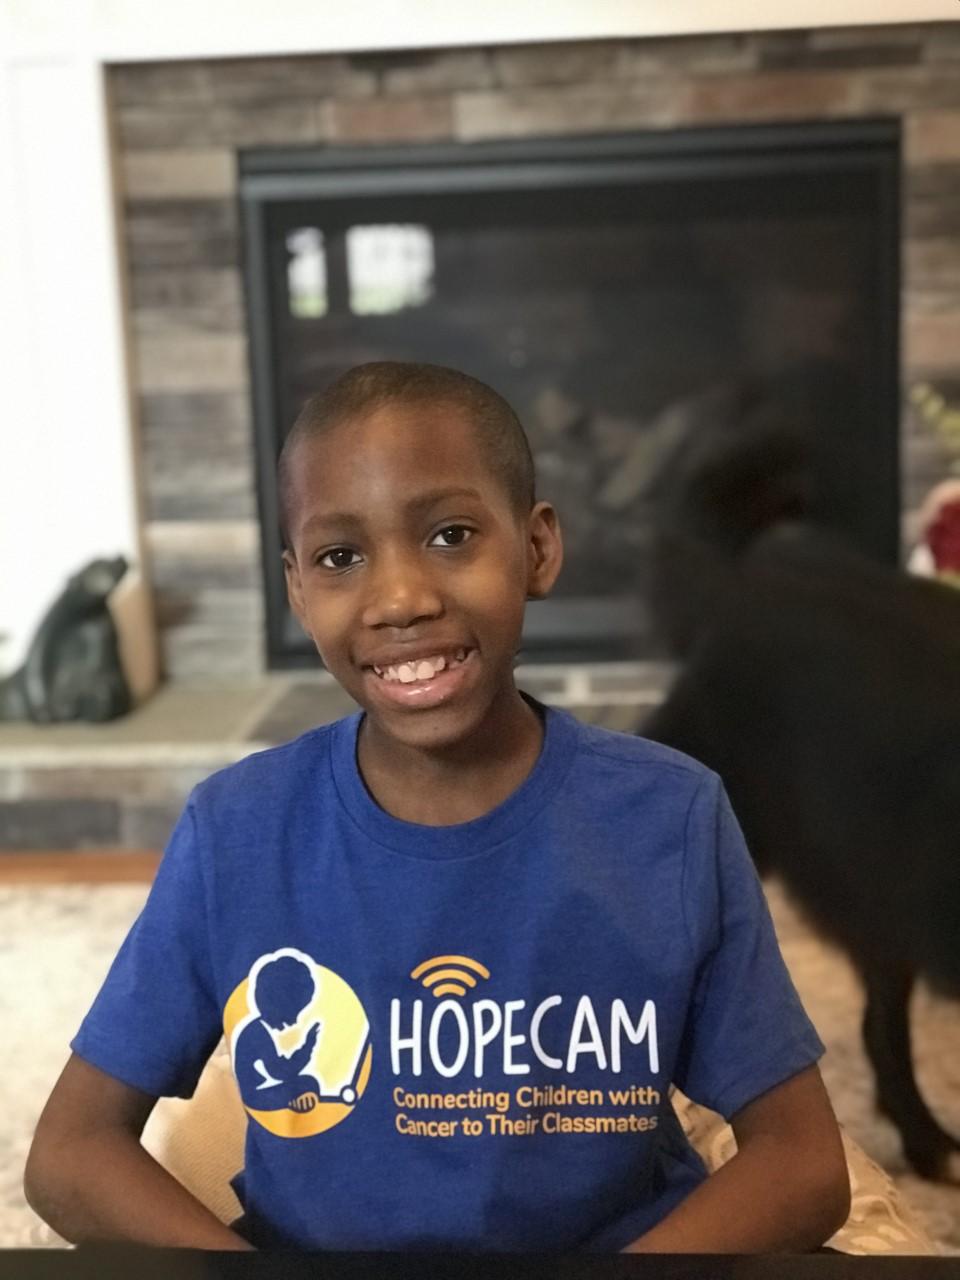 Smiling boy in Hopecam shirt